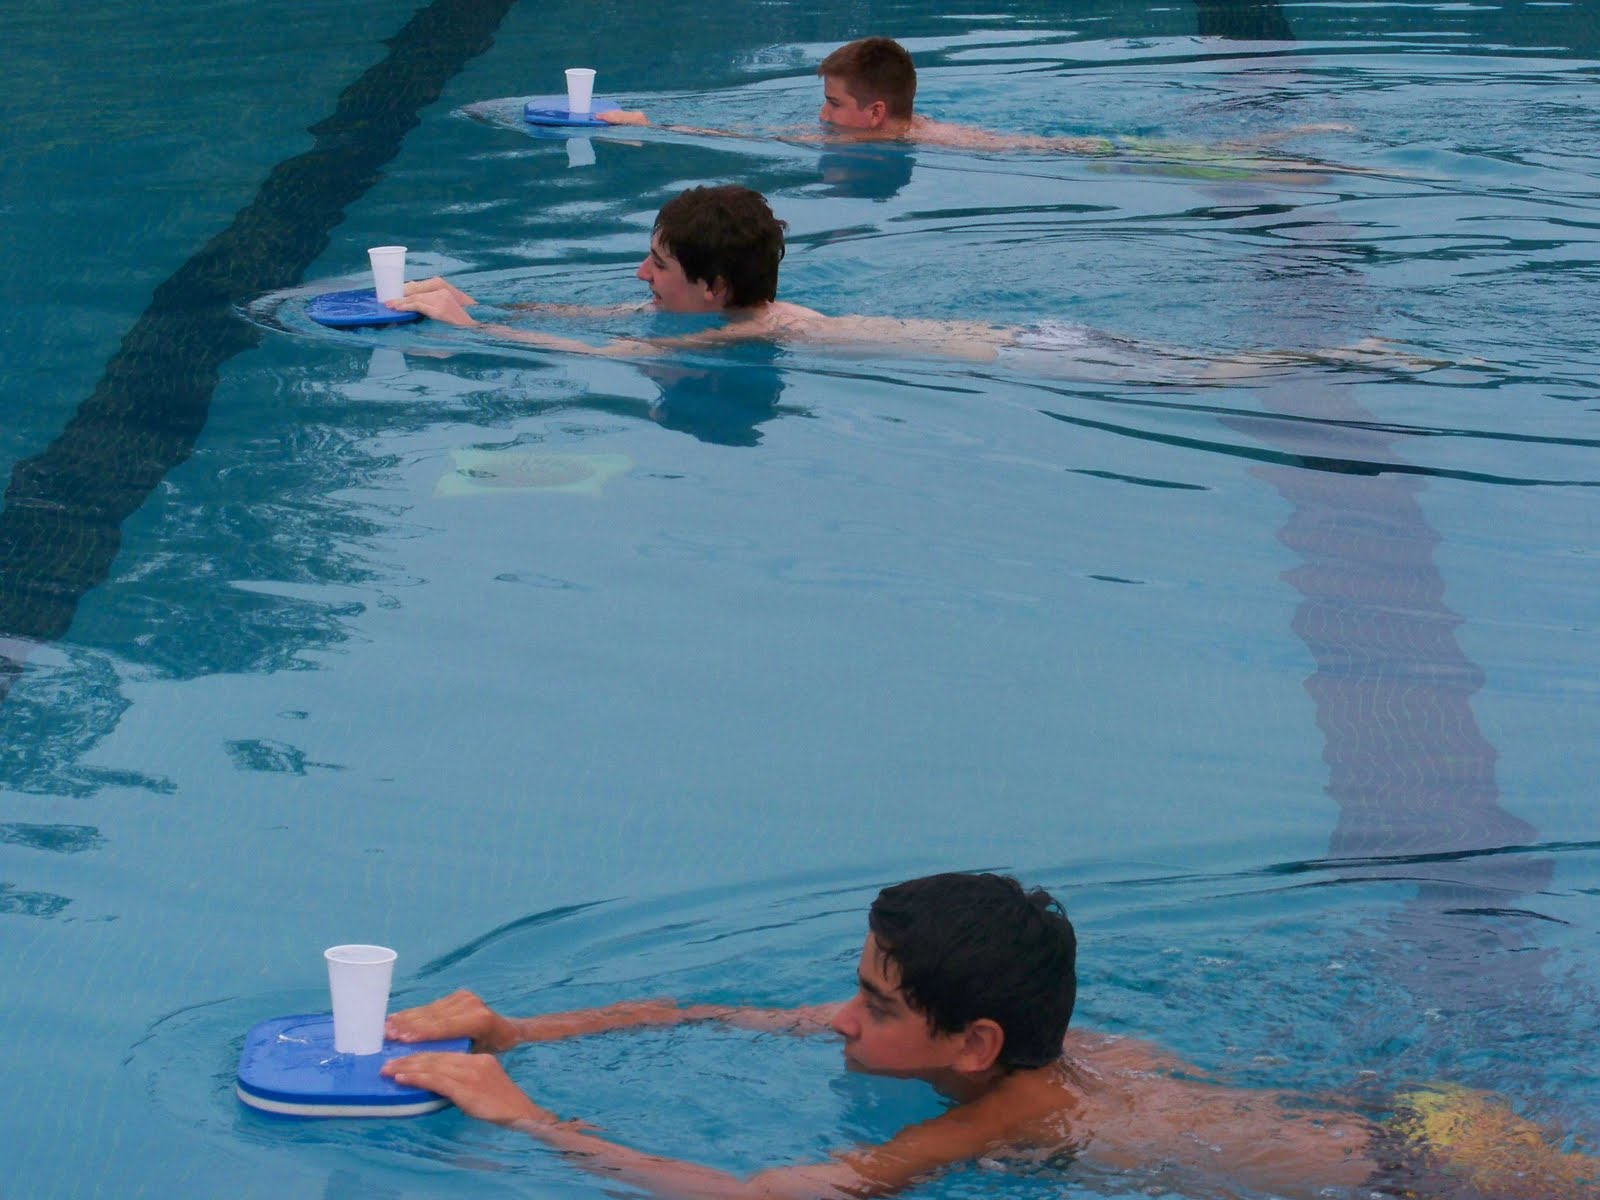 Juegos de relevos en piscina for Jocs de piscina